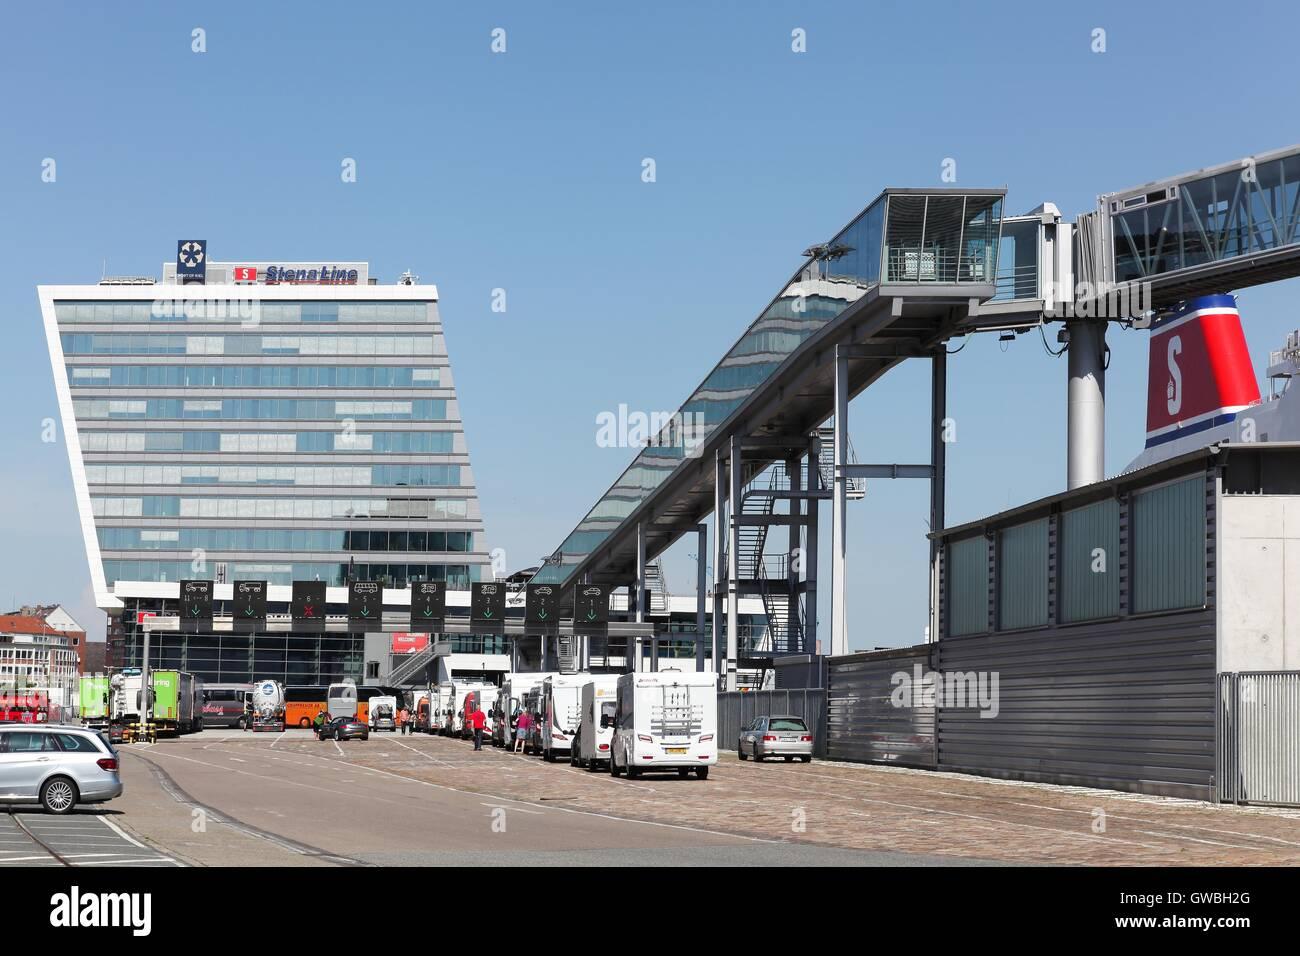 Stena line terminal on the harbor of Kiel, Germany - Stock Image